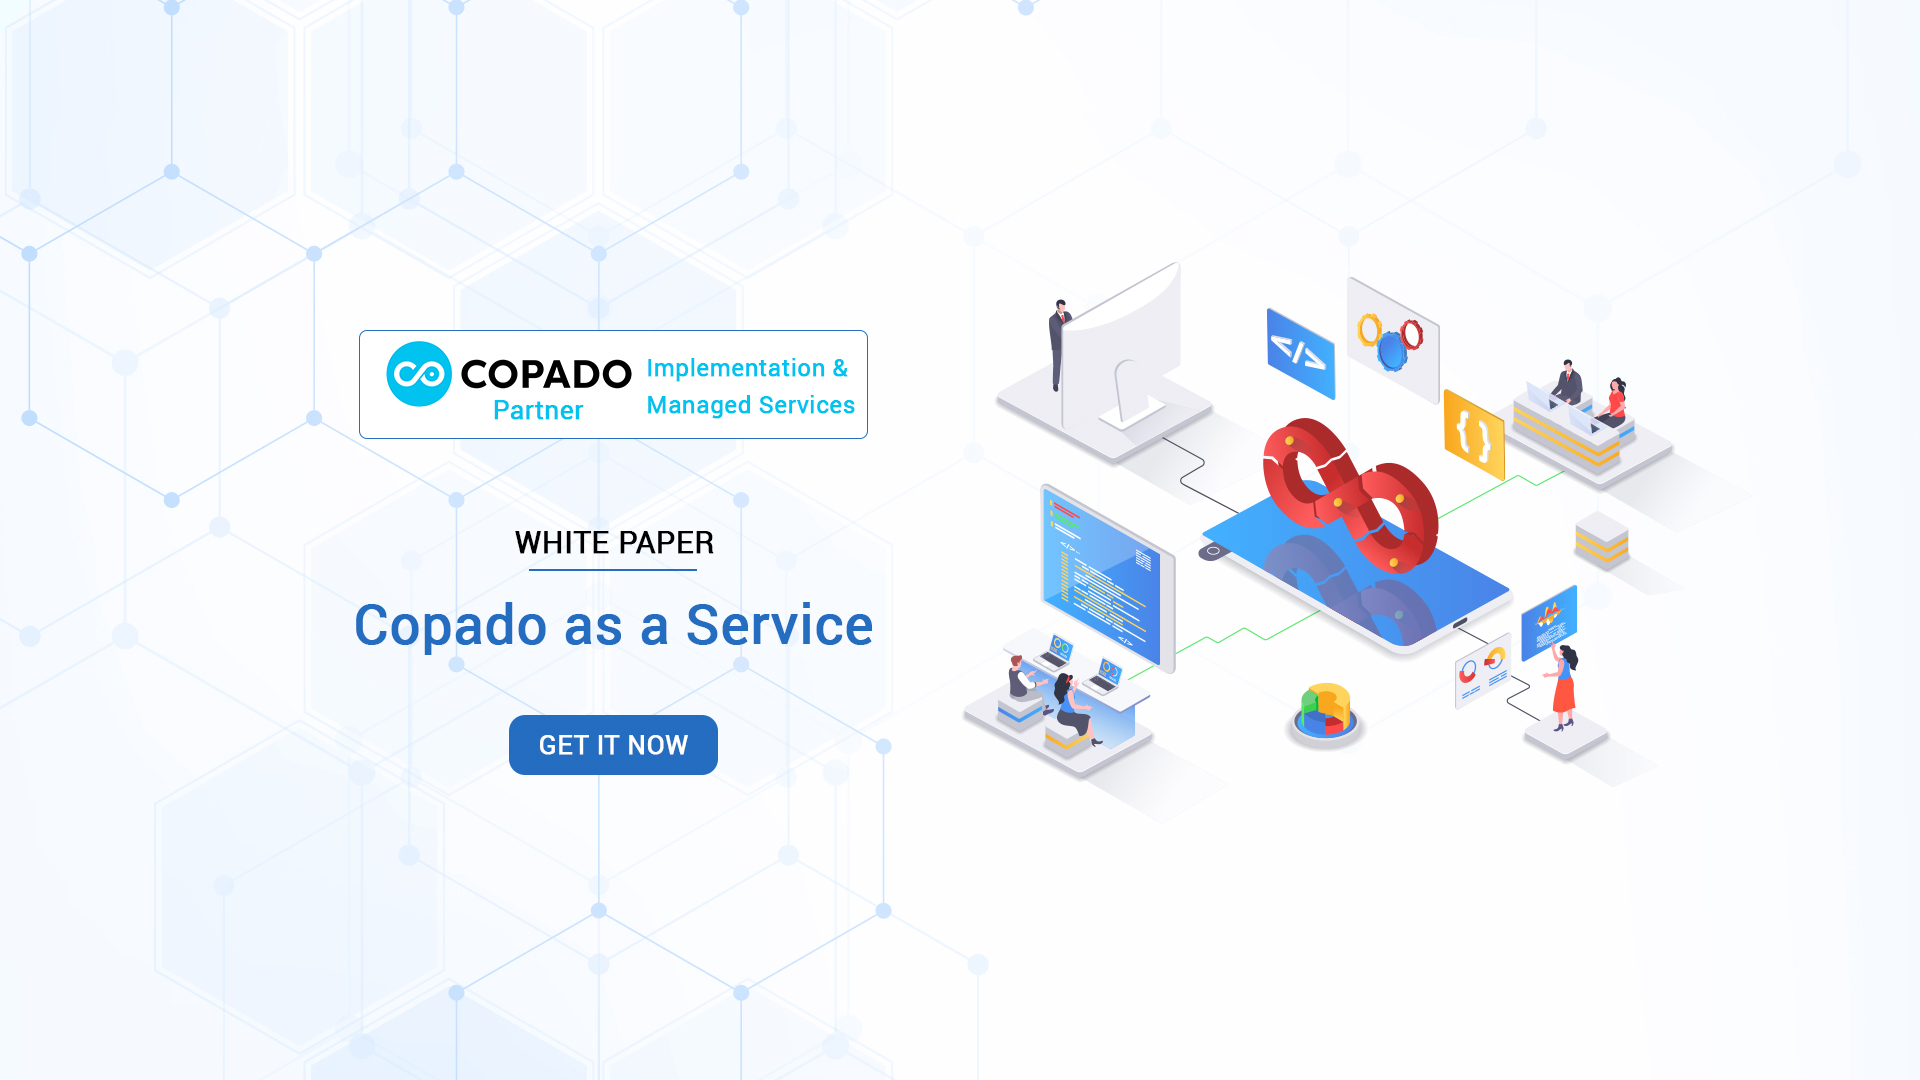 Copado as a service